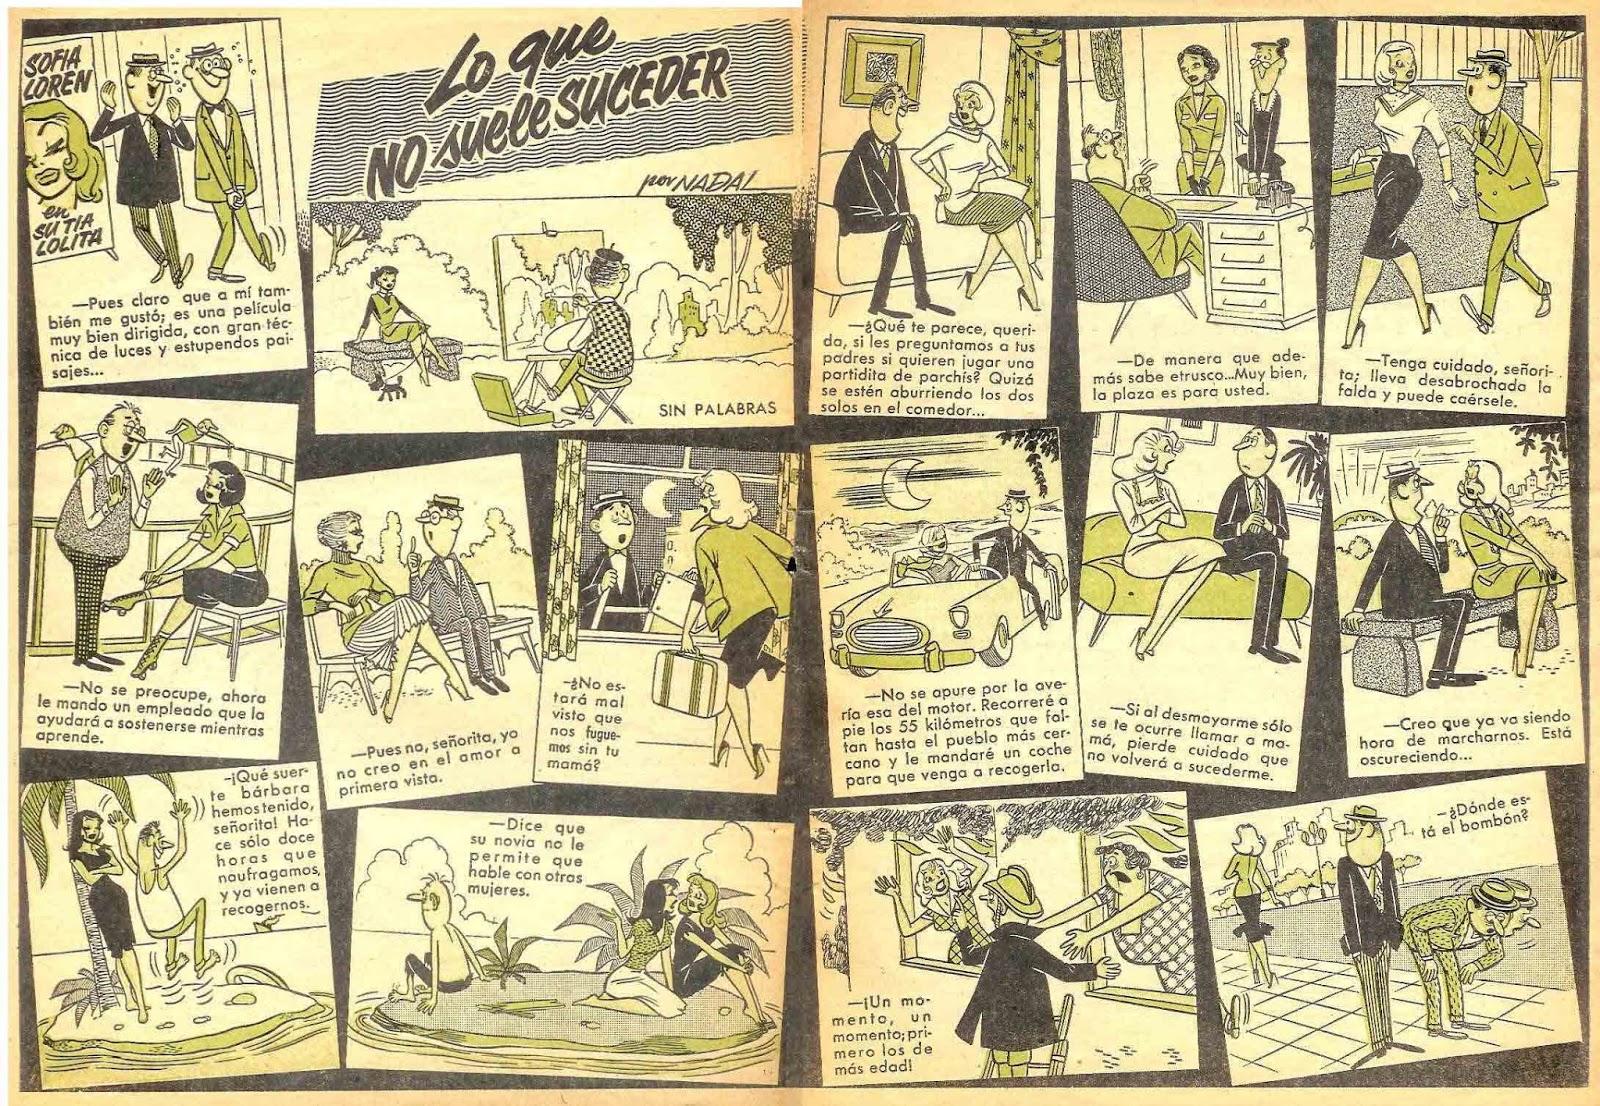 Doble página dibujada por Angel nadal Quirch para Can Can nº 0 Bruguera